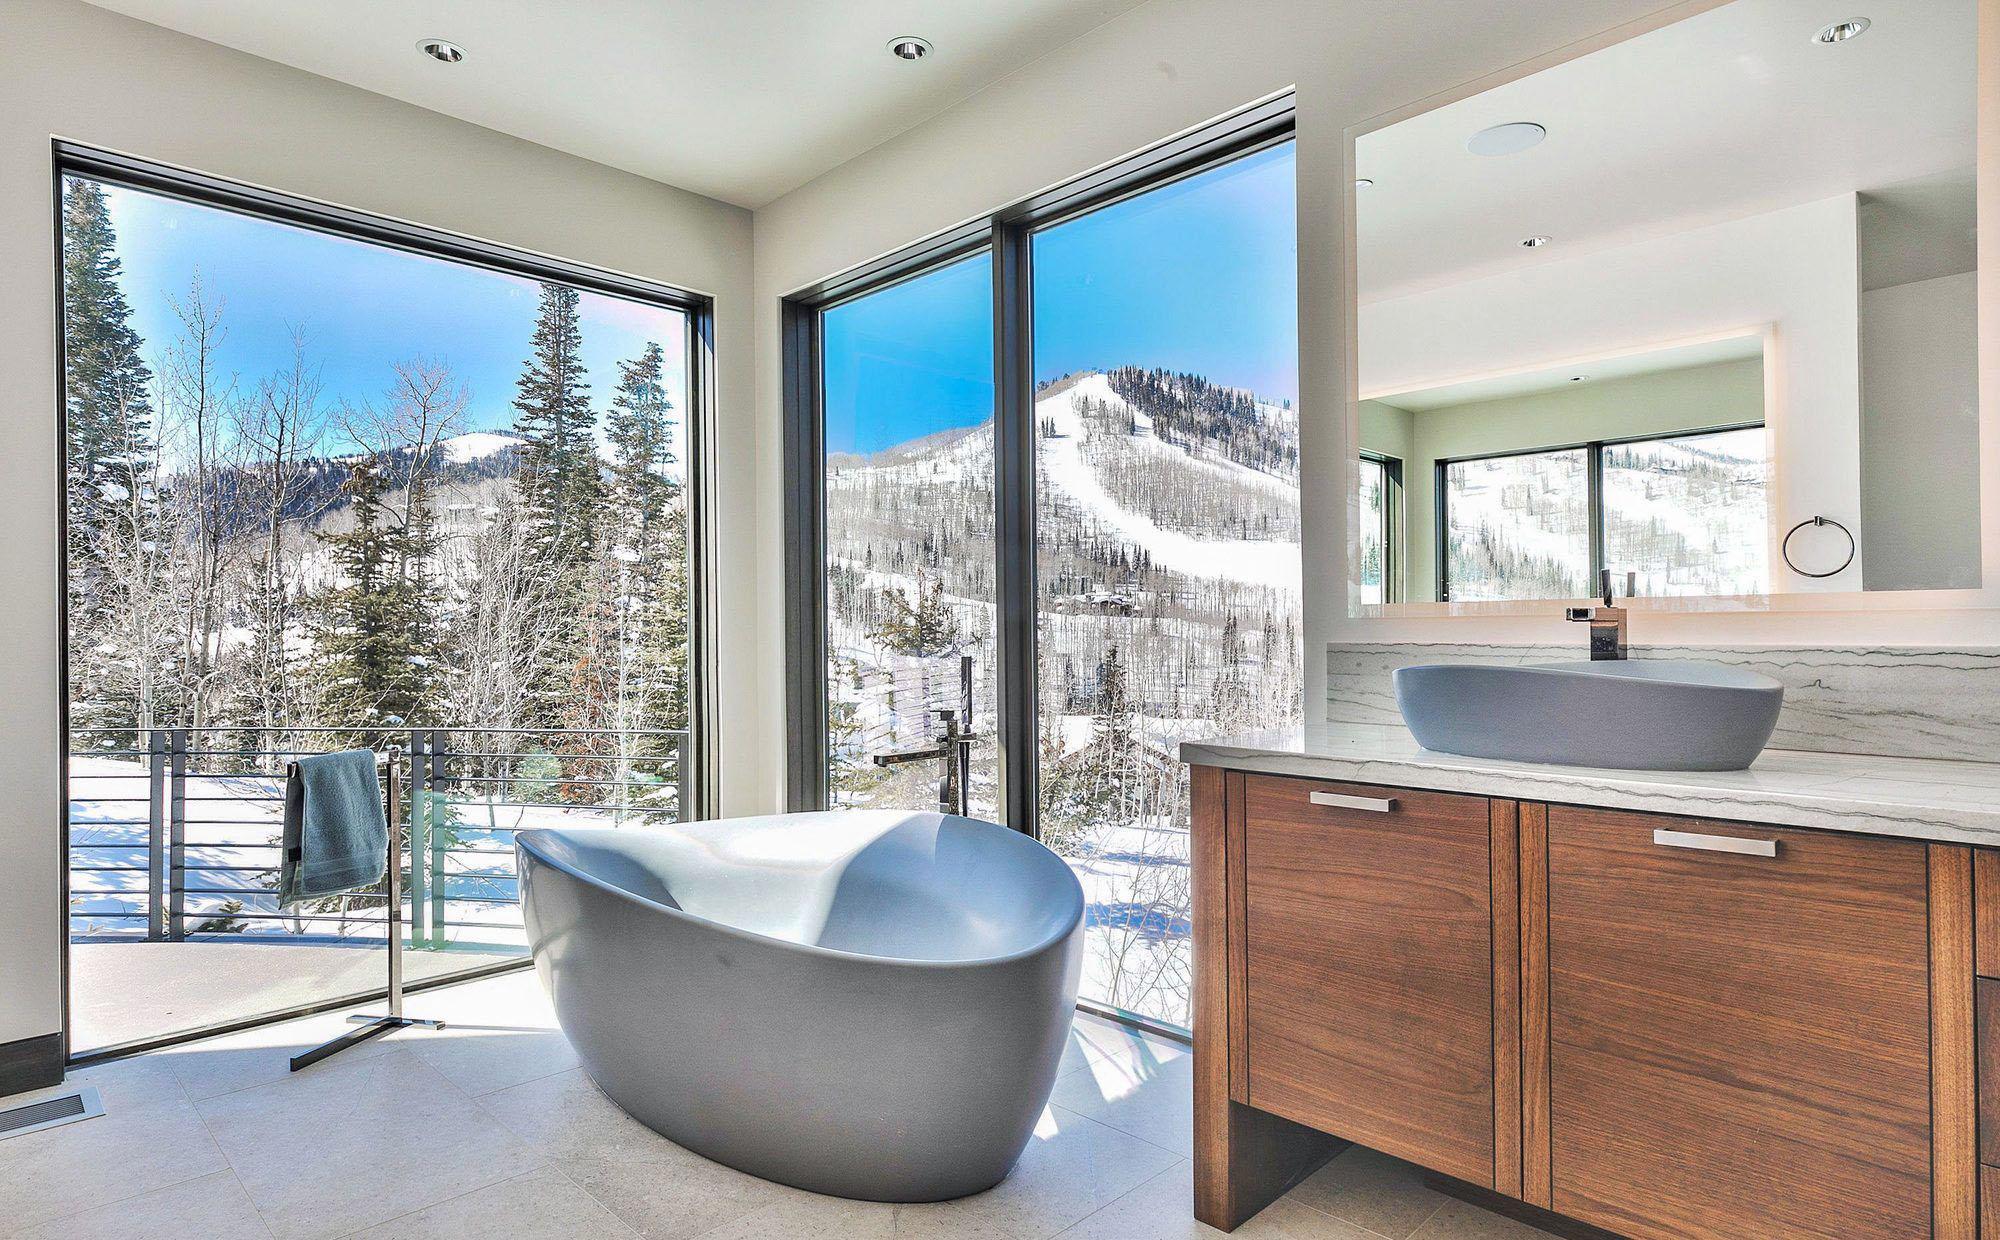 Modern bathroom featuring gray soaking tub, wood vanity with marble countertop. Huge walls of glass.